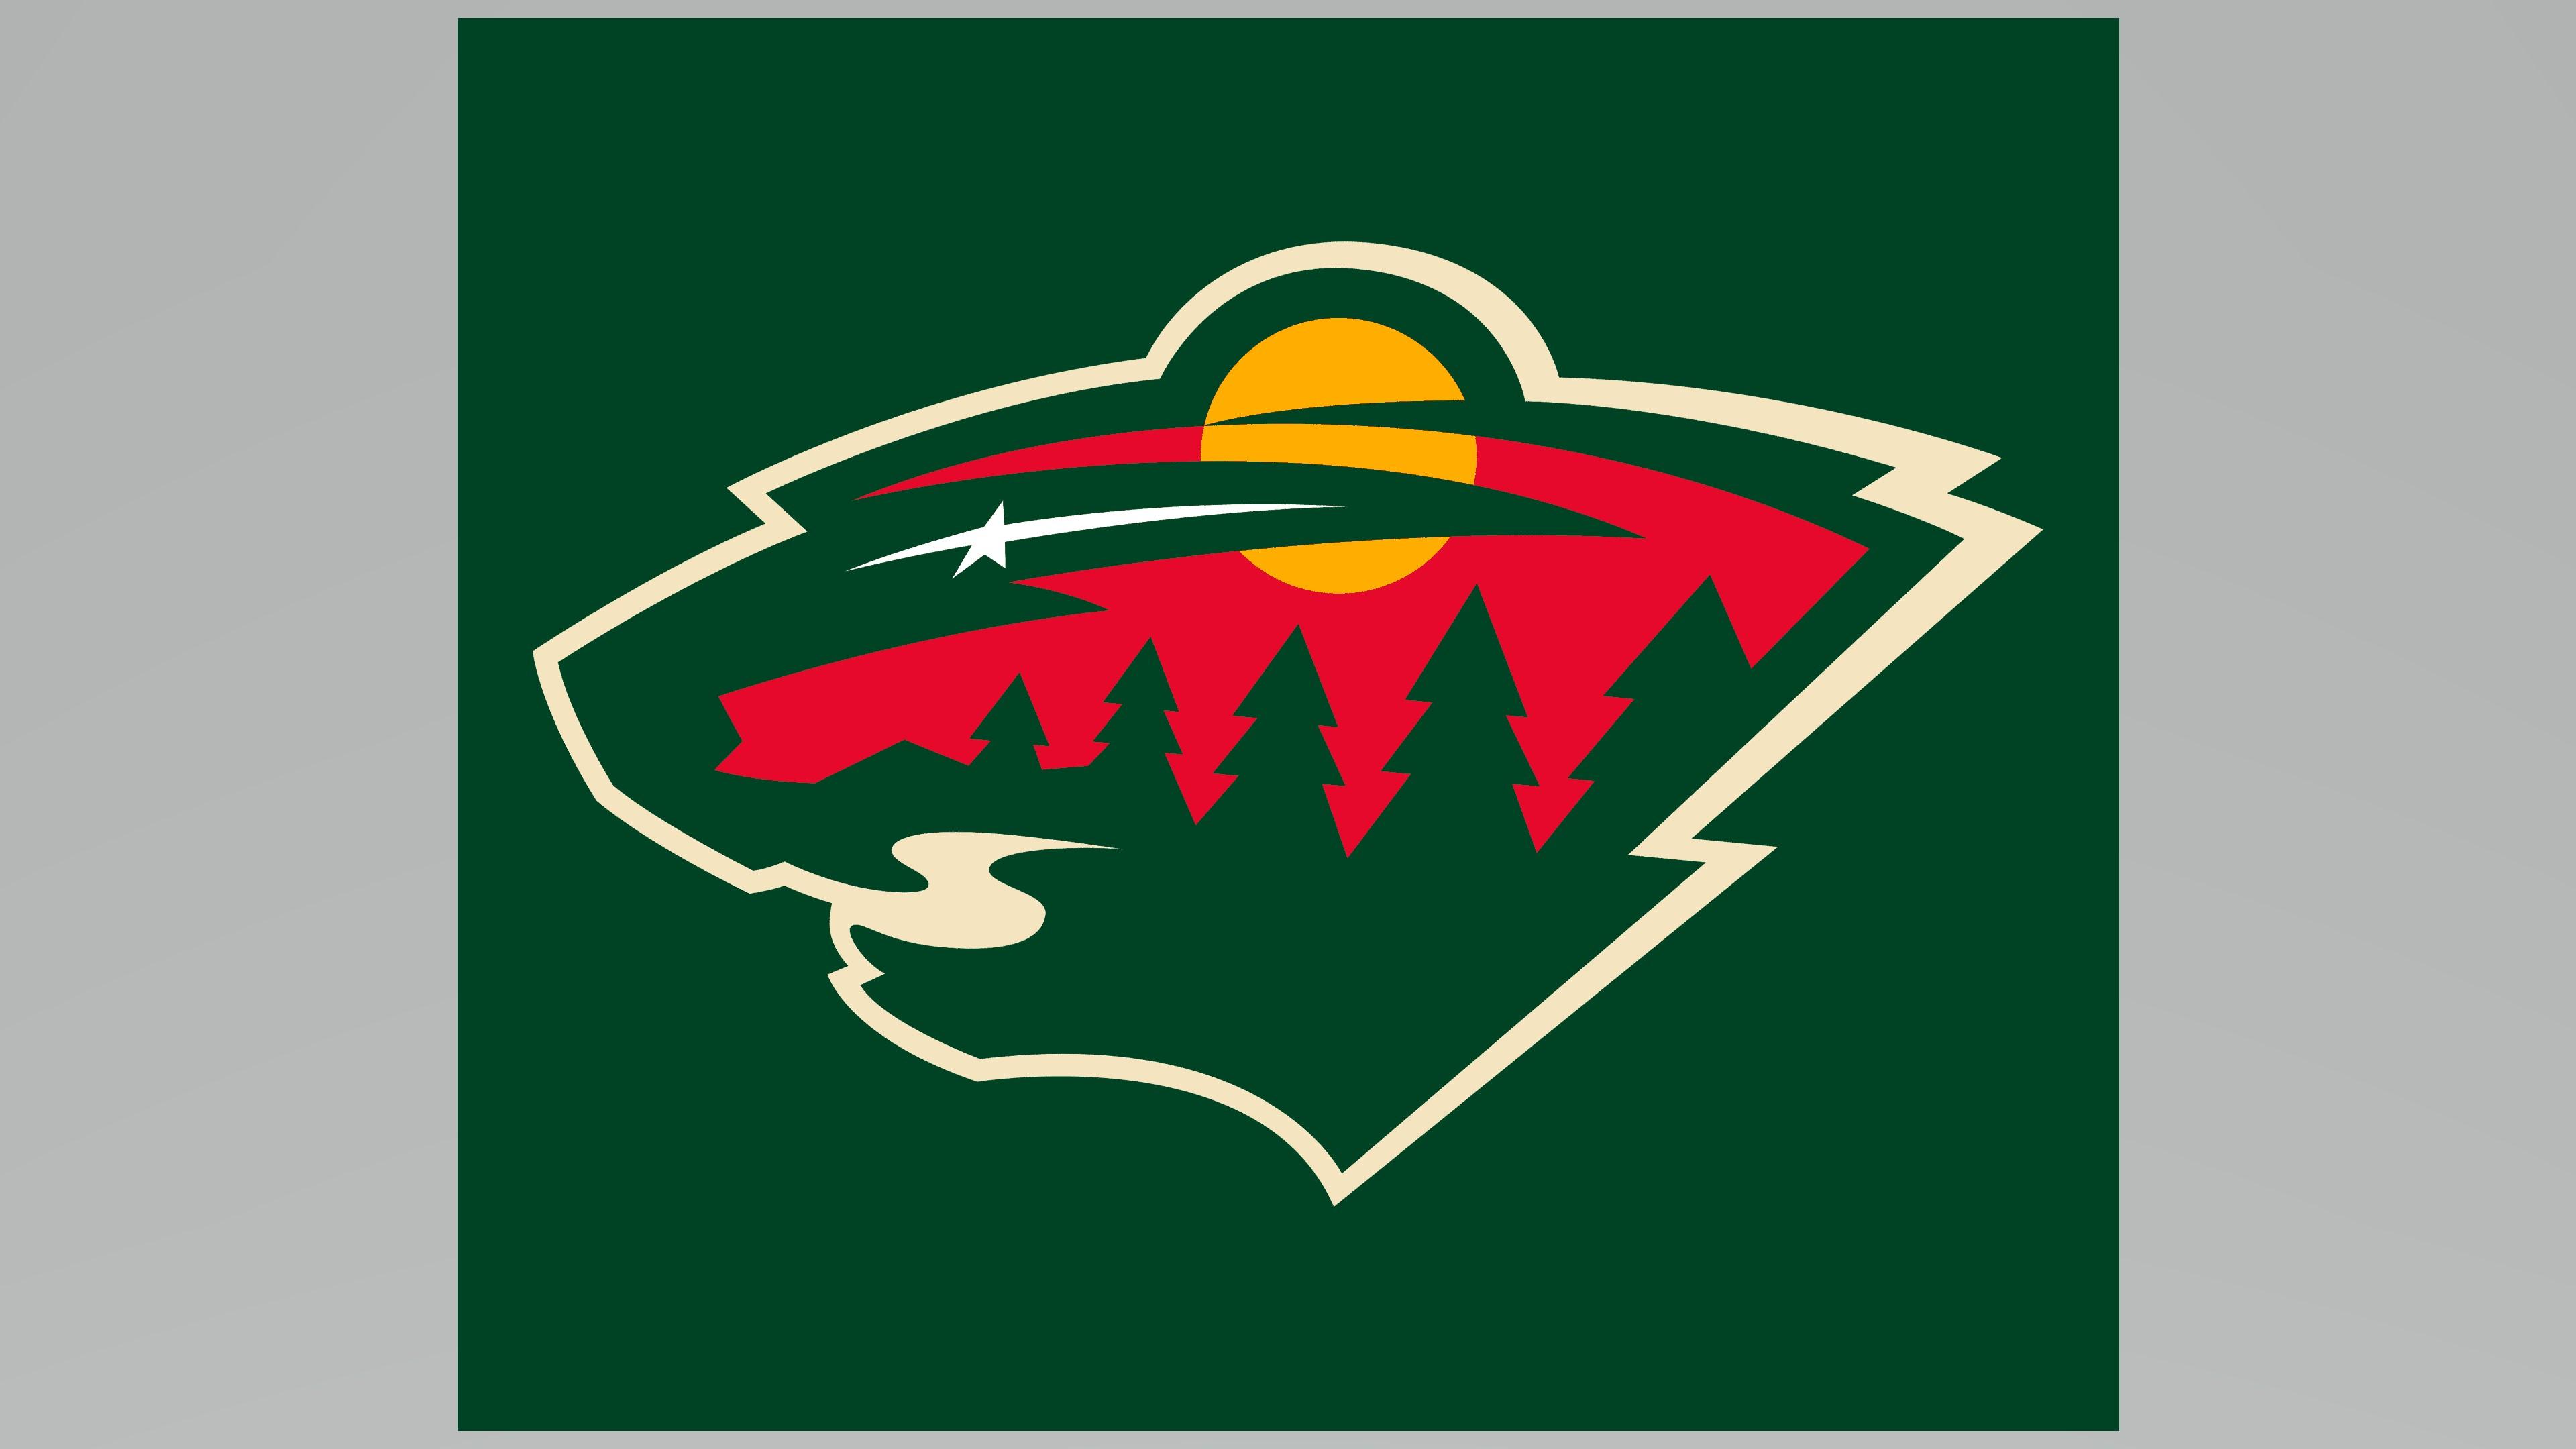 The Minnesota Wild